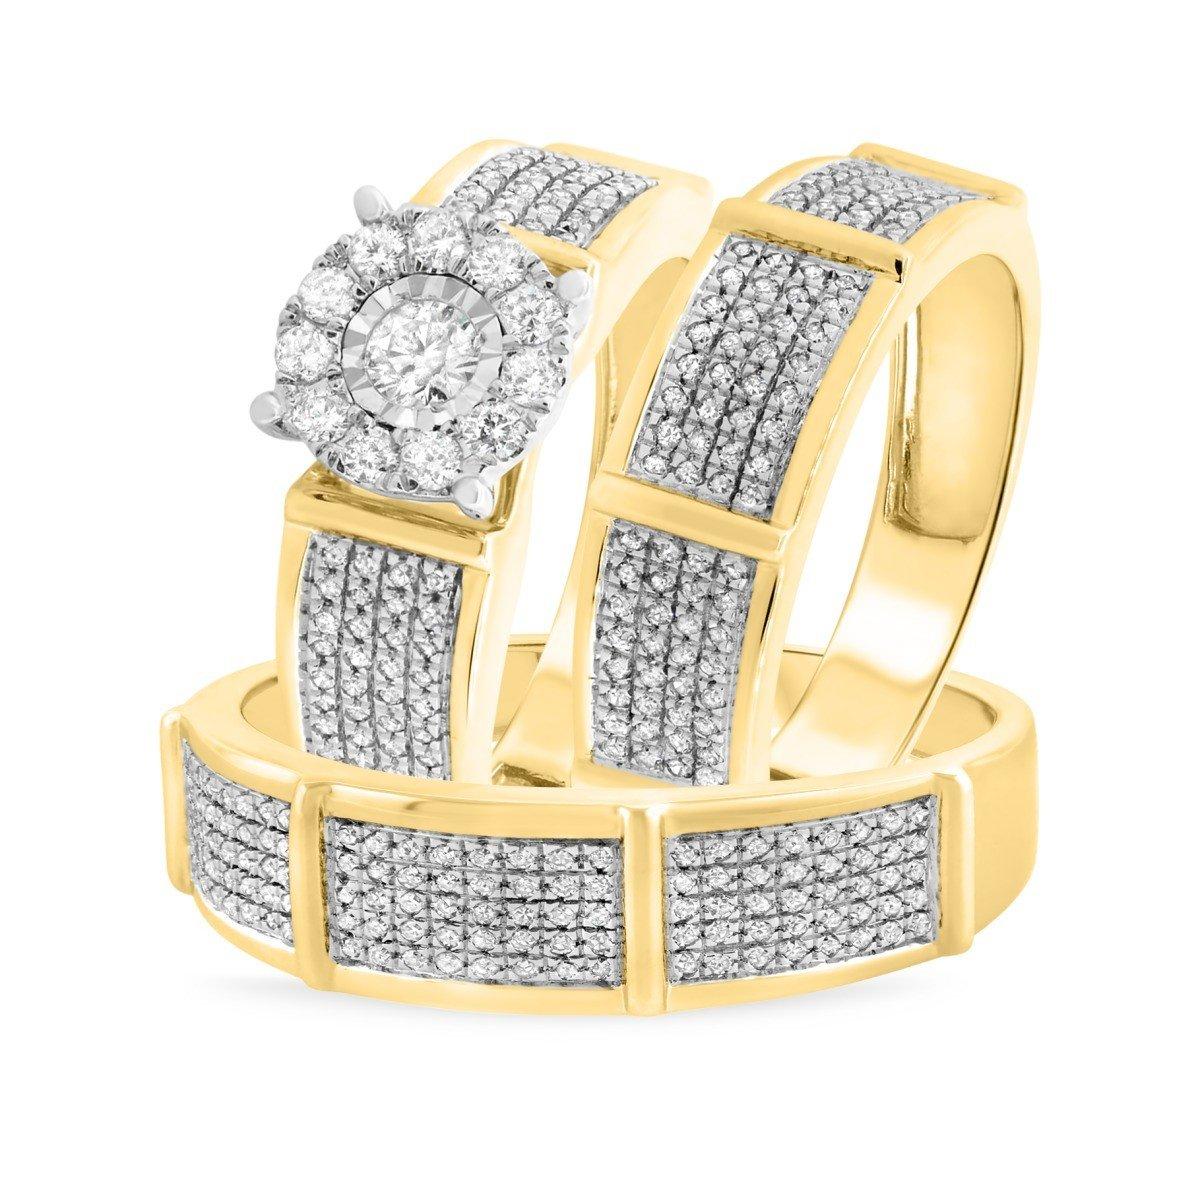 2heart 1 Ct Sim Diamond Mens/Womens 3 Piece Trio Engagement Ring Set 14K Yellow Gold Over